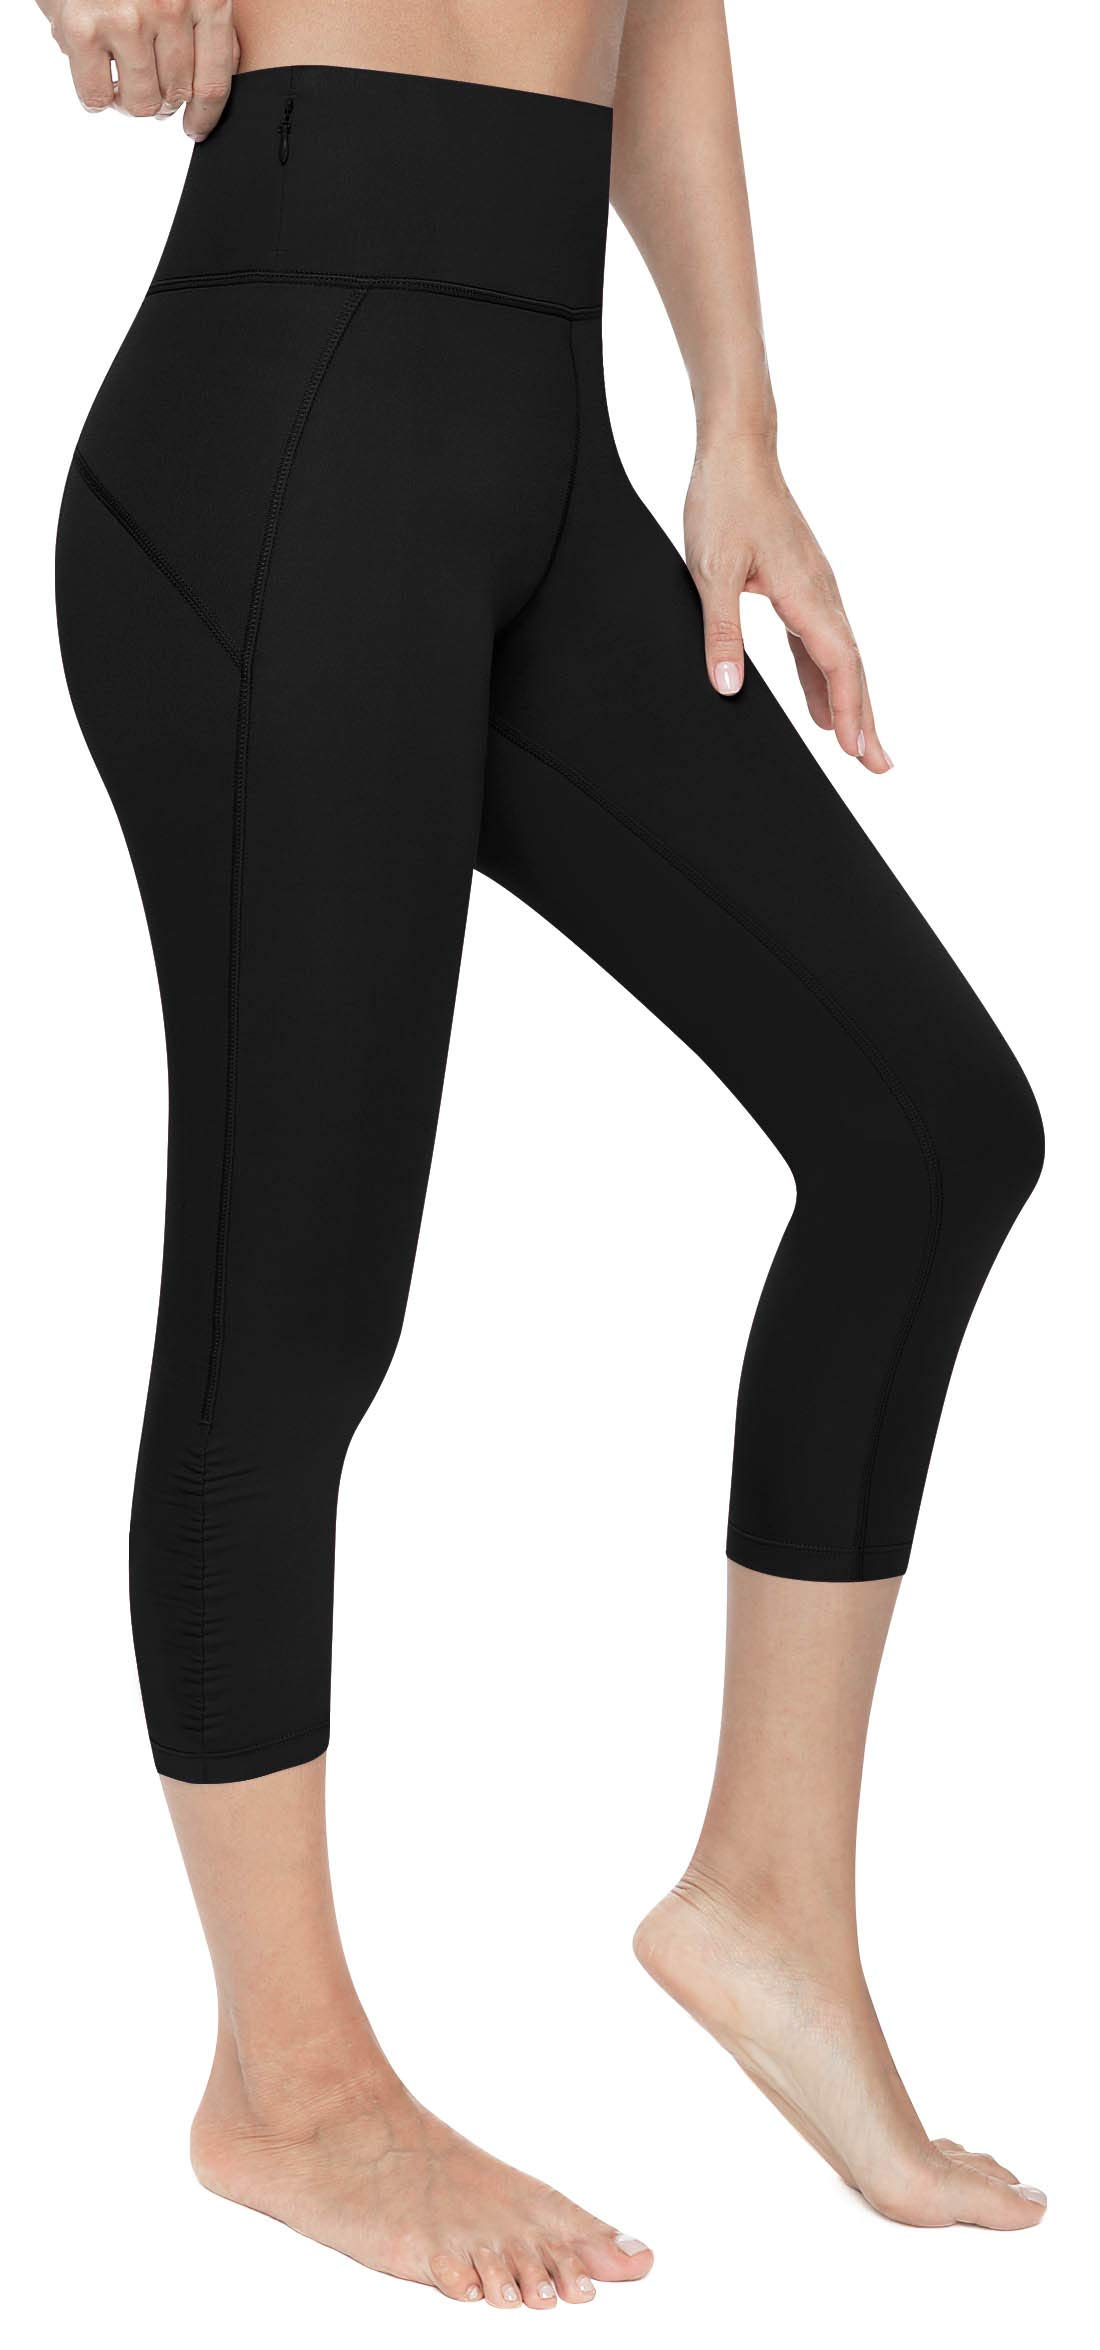 VUTRU Women's Yoga Capri Pants Sport Tights Workout Running Yoga Leggings with Pocket